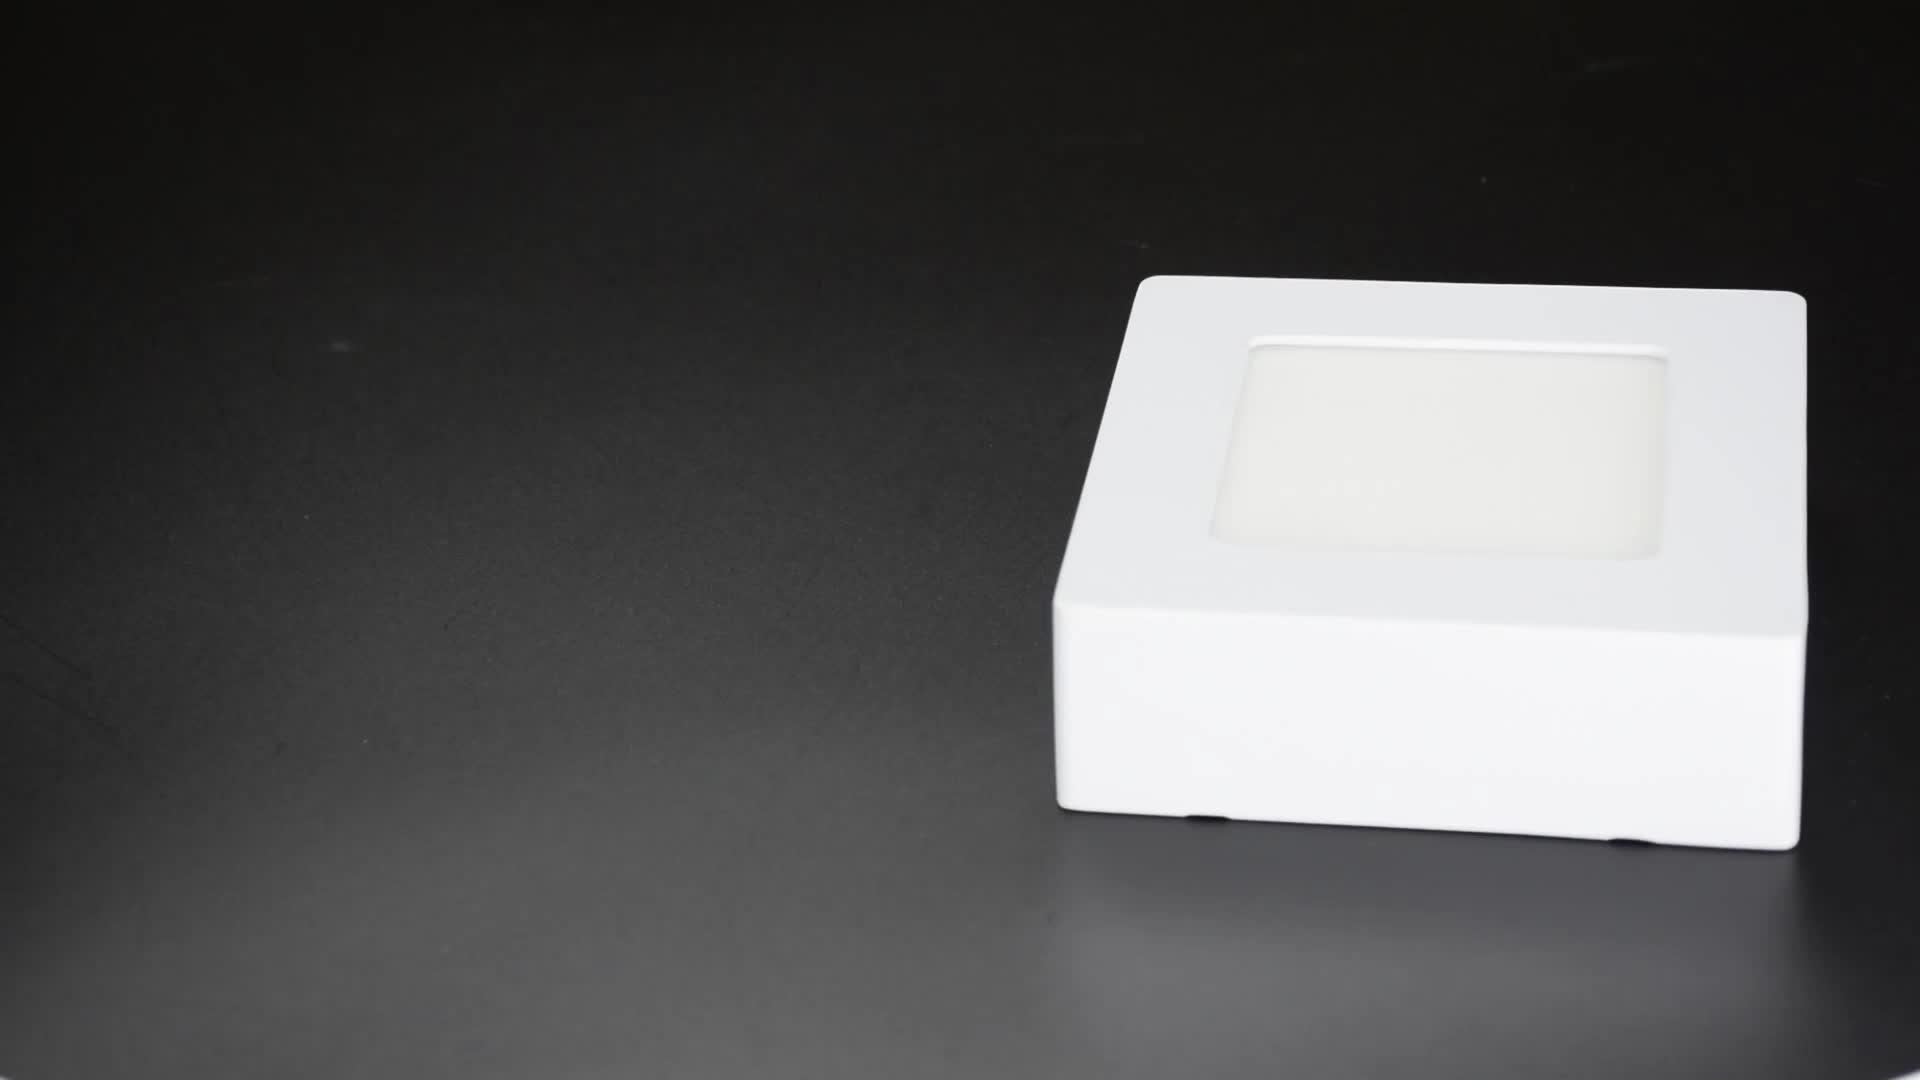 led panel light 18w  Surface Mounted  High quality Square Led Ceiling Light for office led tile light